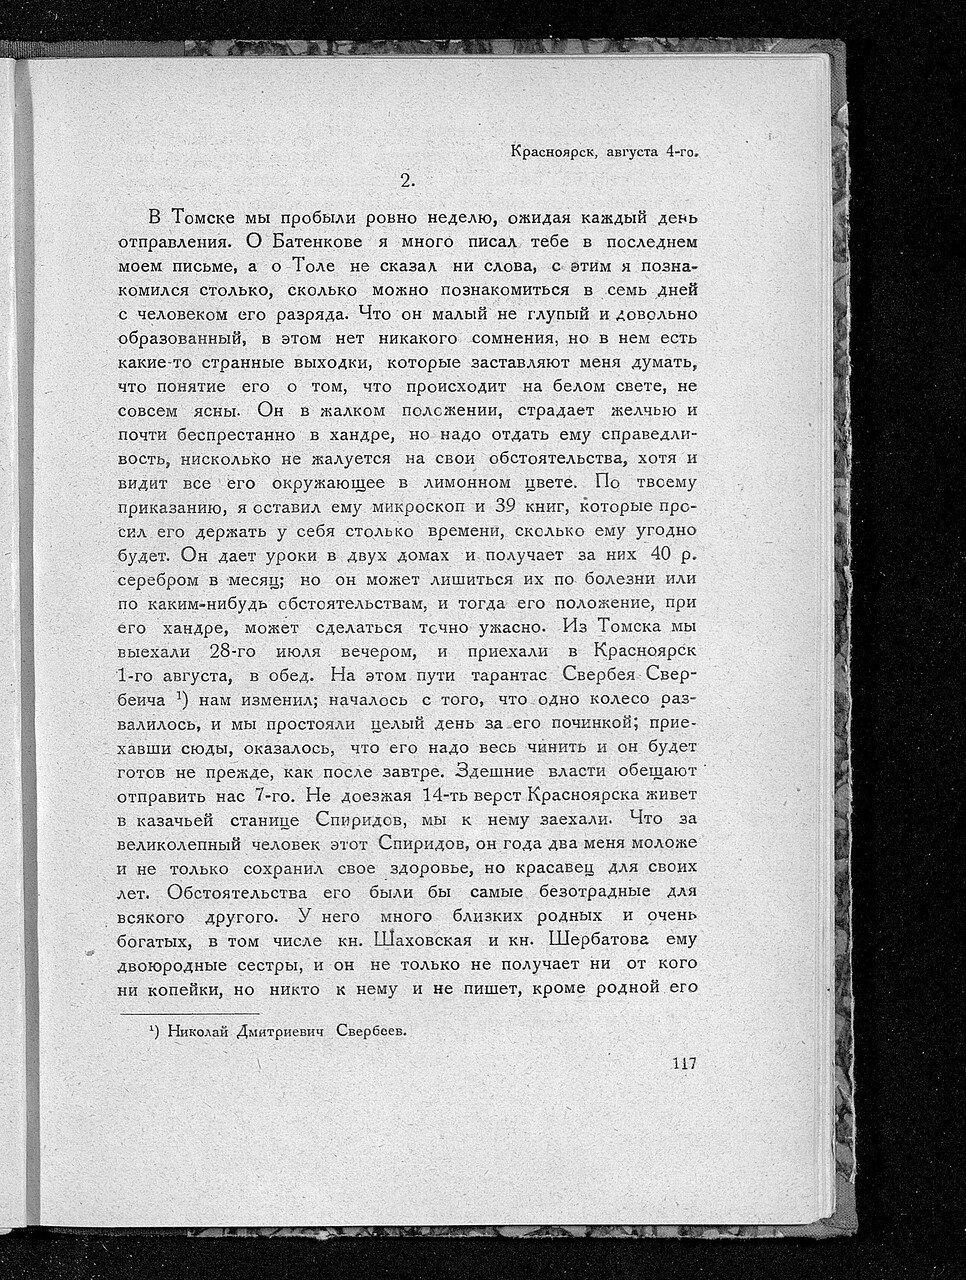 https://img-fotki.yandex.ru/get/477594/199368979.a2/0_214370_d1b15a43_XXXL.jpg